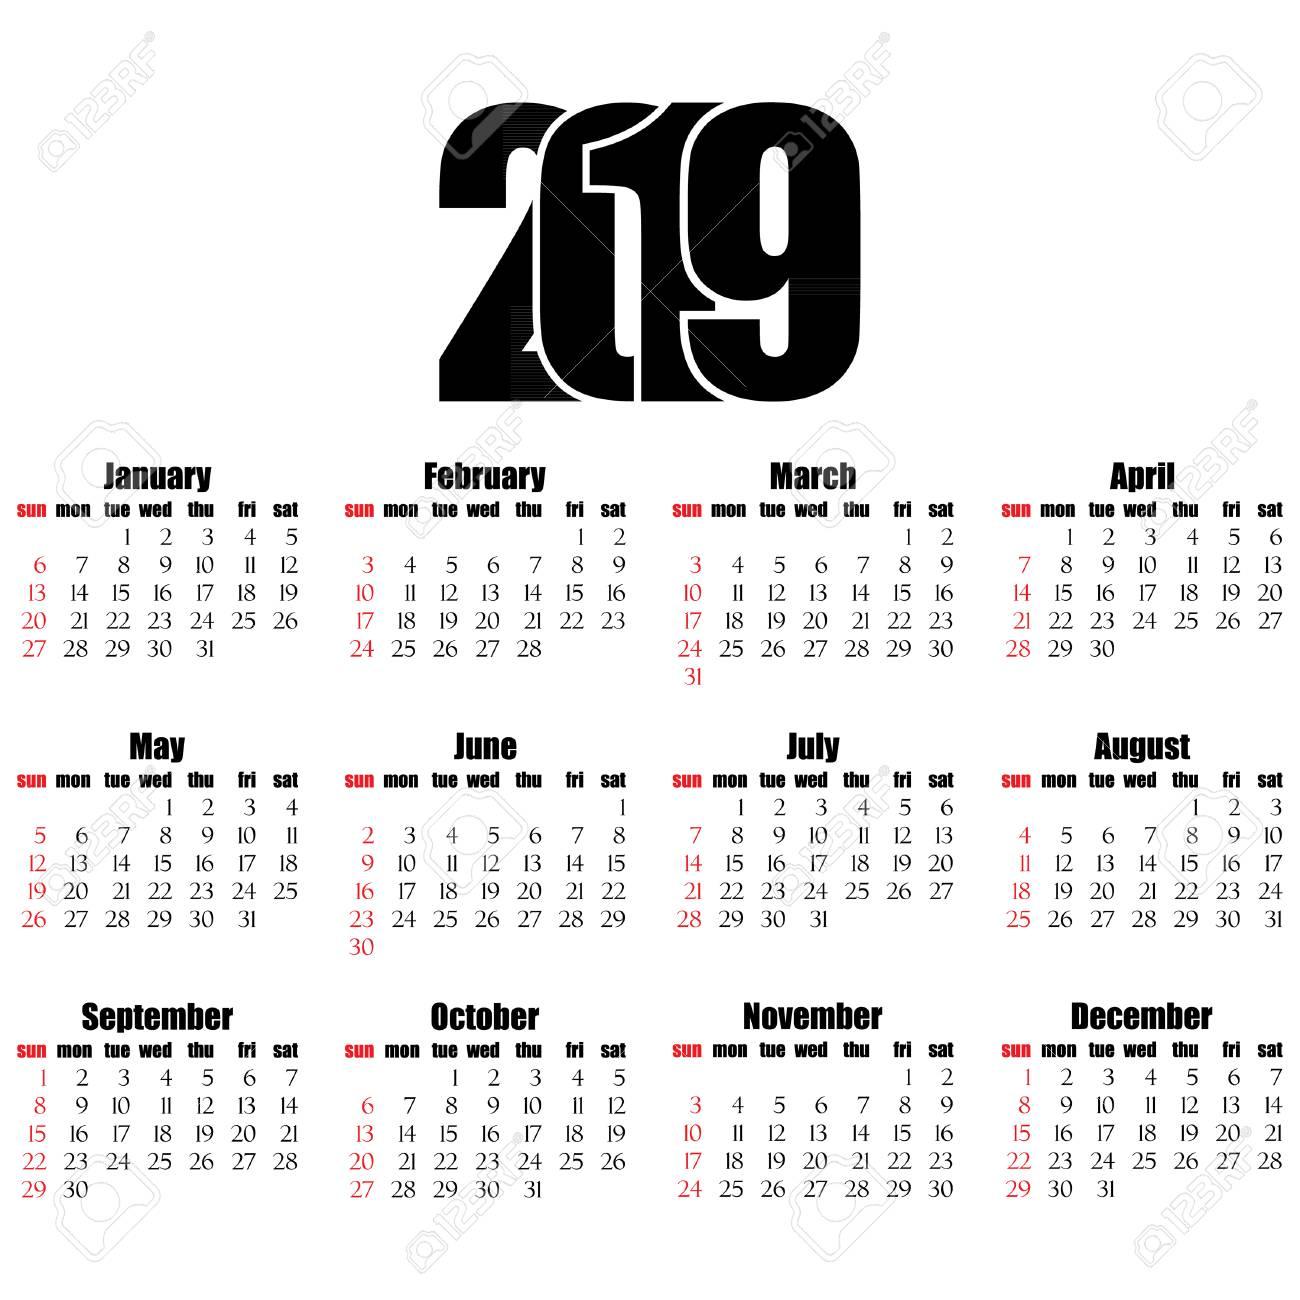 Calendario 2019 Con Numero Week.Calendar 2019 Year Flat Design Simple Style Week Starts From